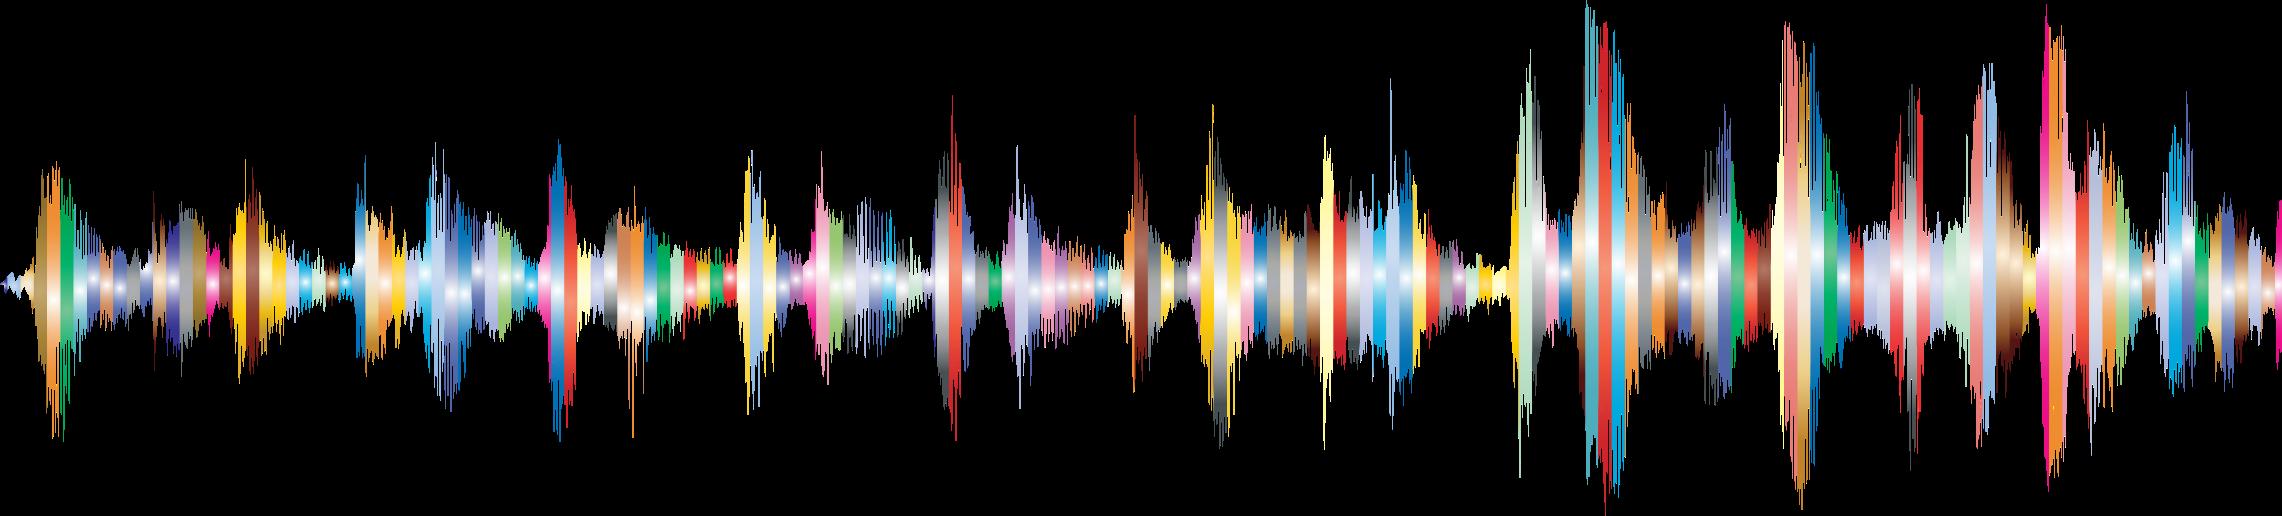 Waves clipart rainbow. Rgb sound wave big